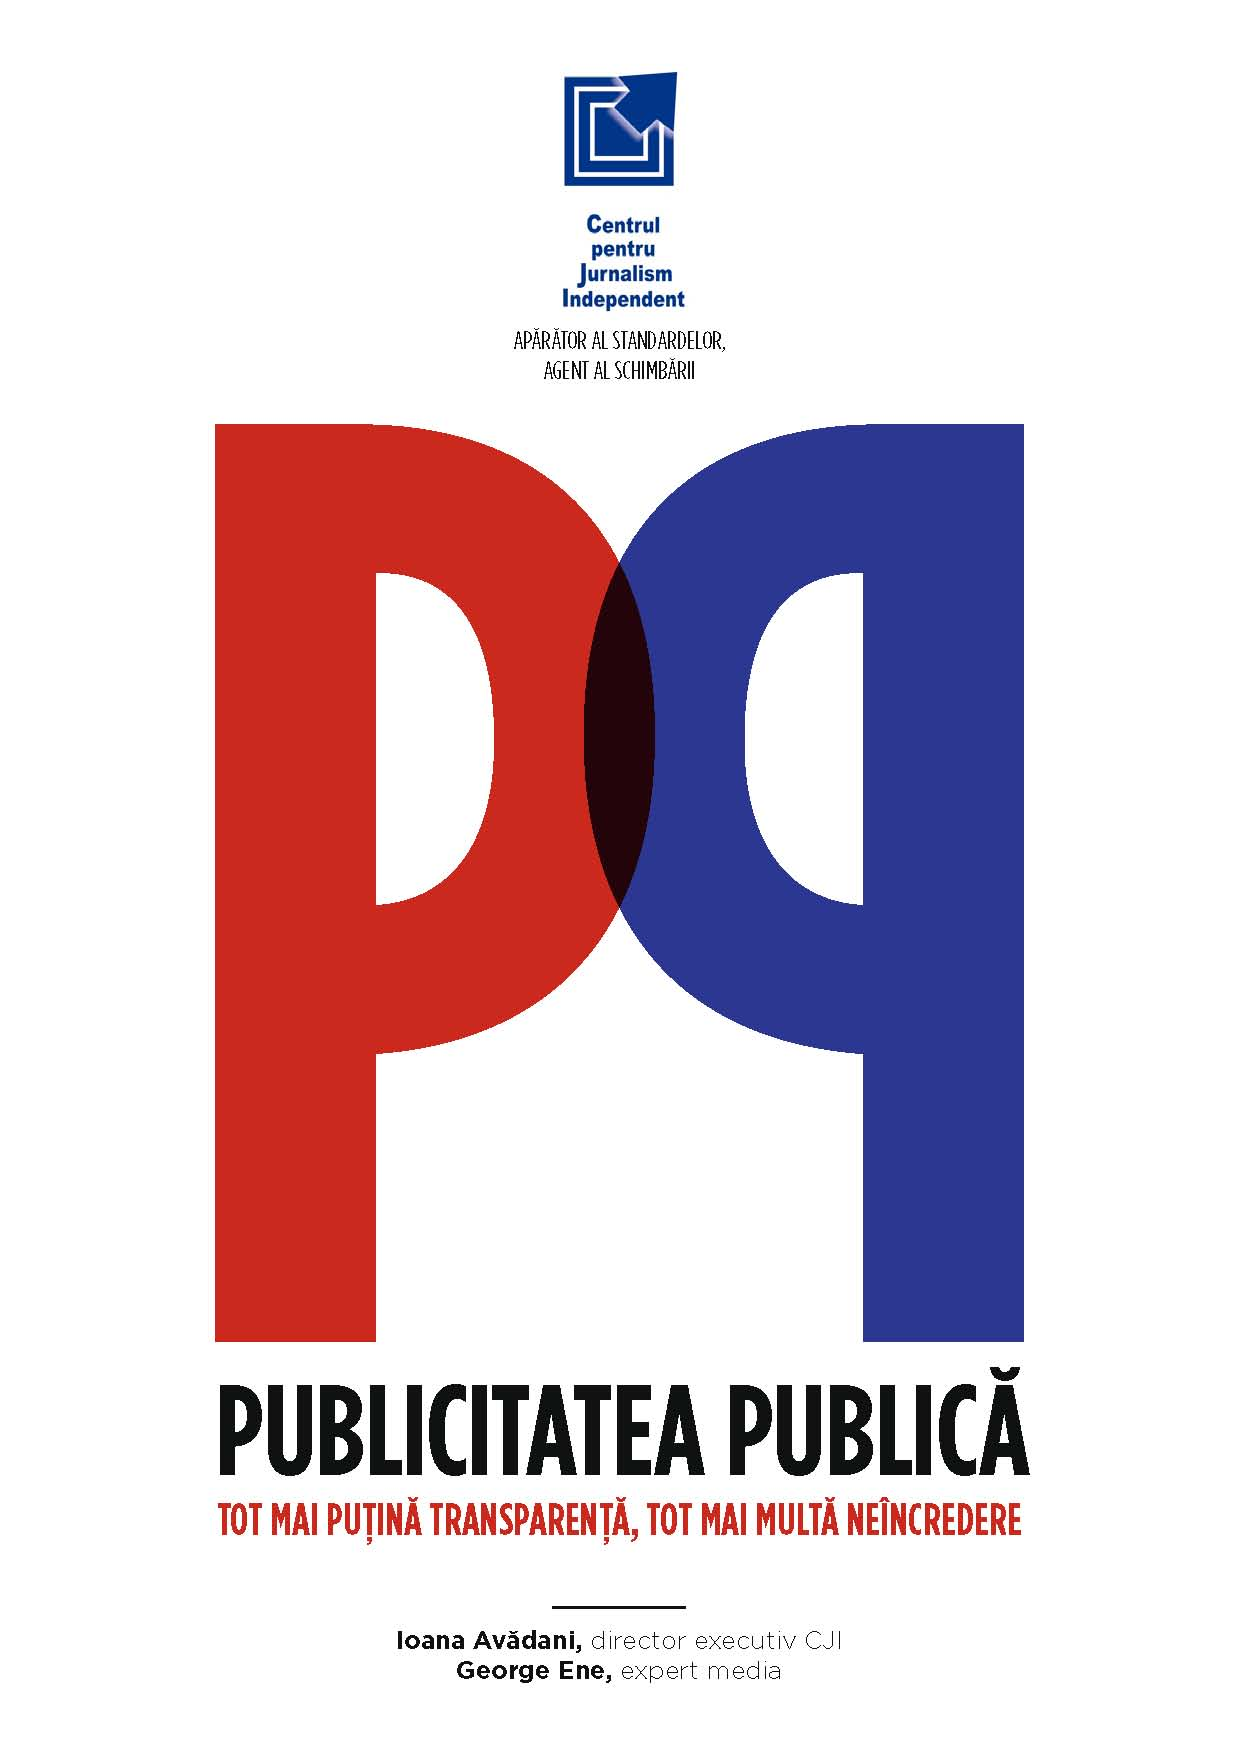 Publicitatea publica: tot mai putina transparenta, tot mai multa neincredere